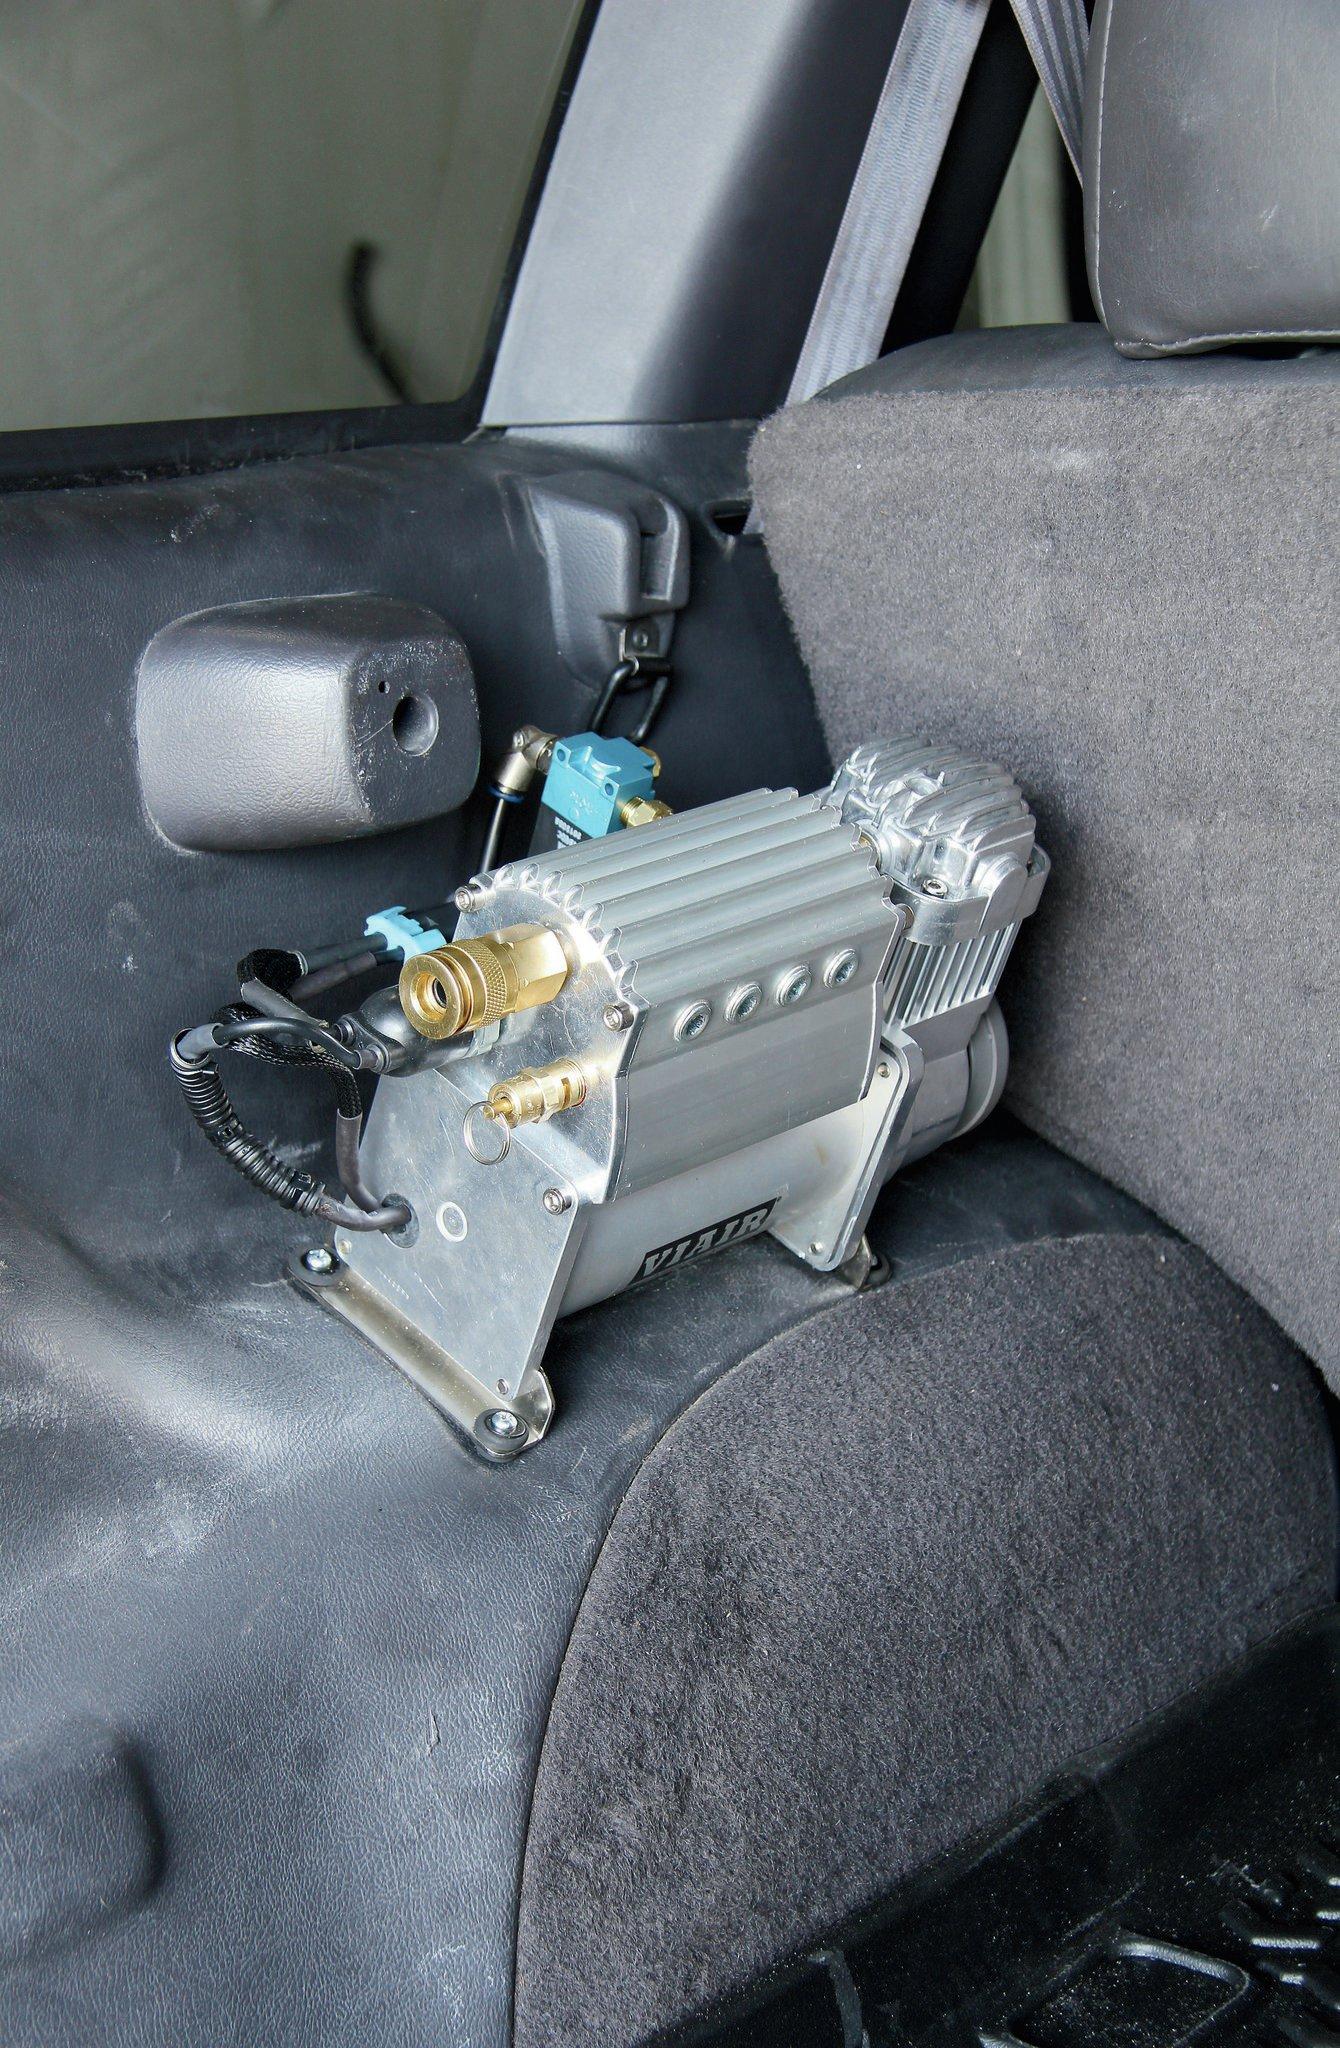 viair air compressor installed